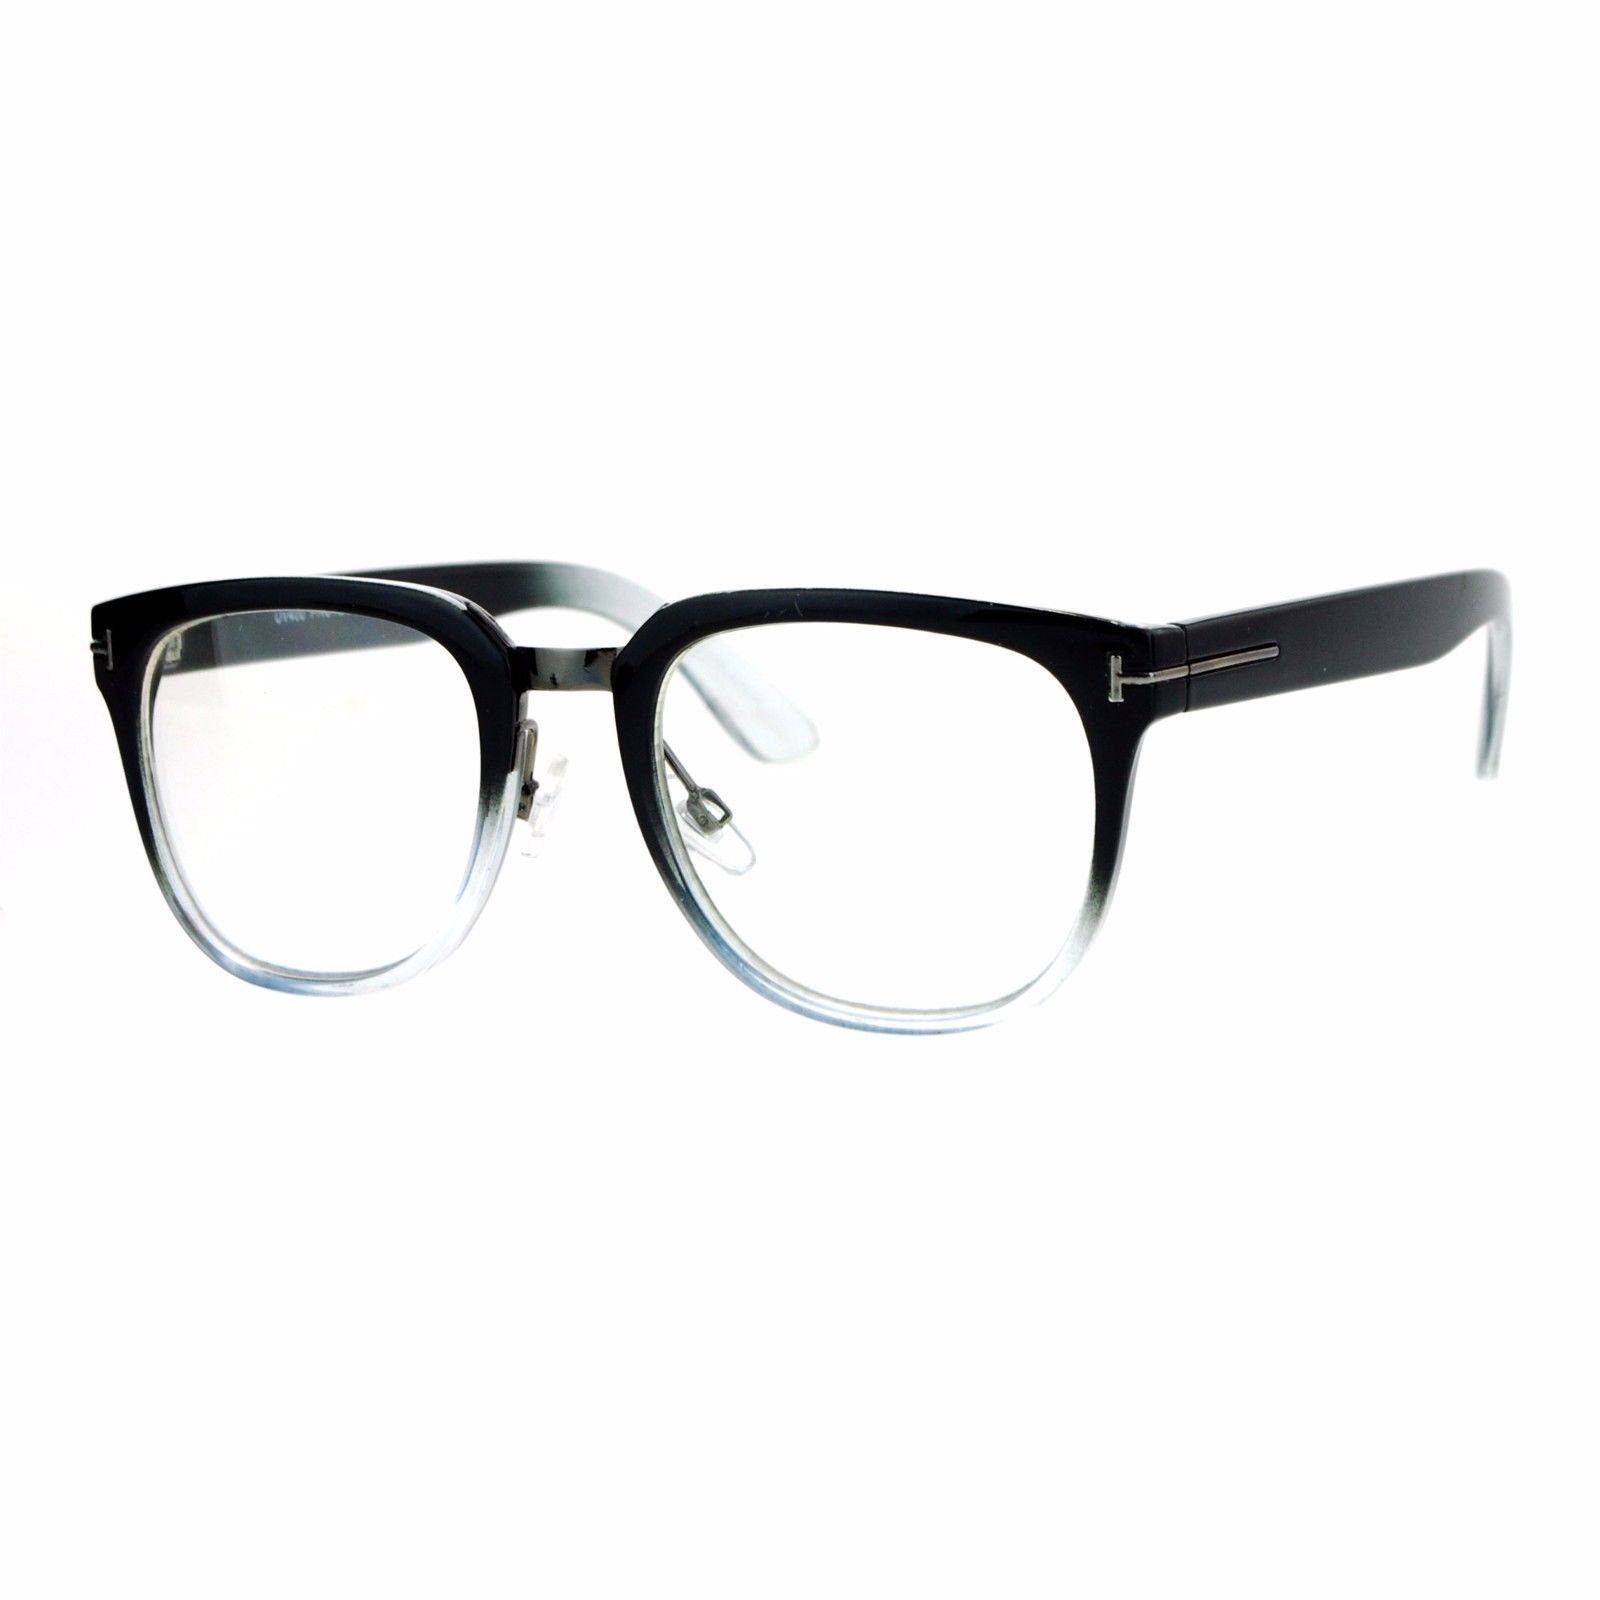 Clear Lens Eyeglasses Unisex Designer Fashion Square Frame UV 400